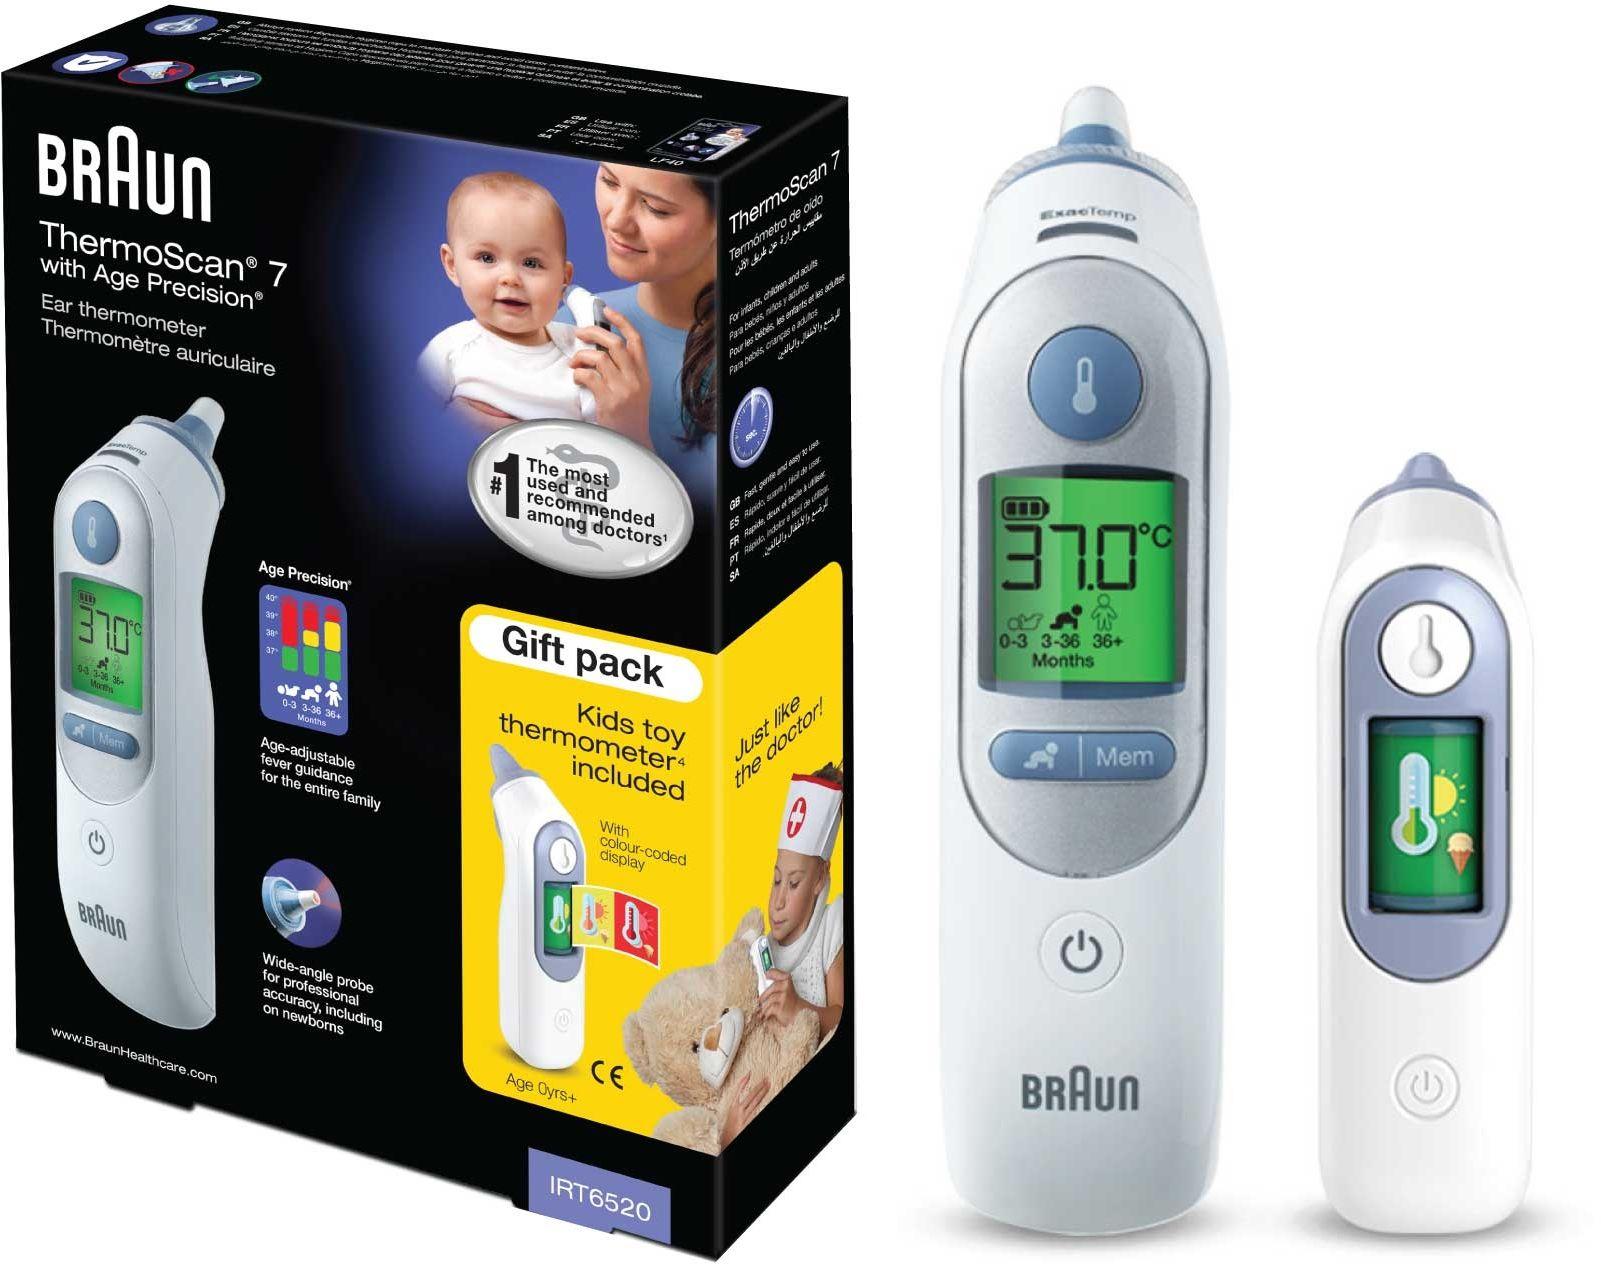 Braun IRT6520 Thermoscan 7 + zabawka Termometr do ucha + zabawka